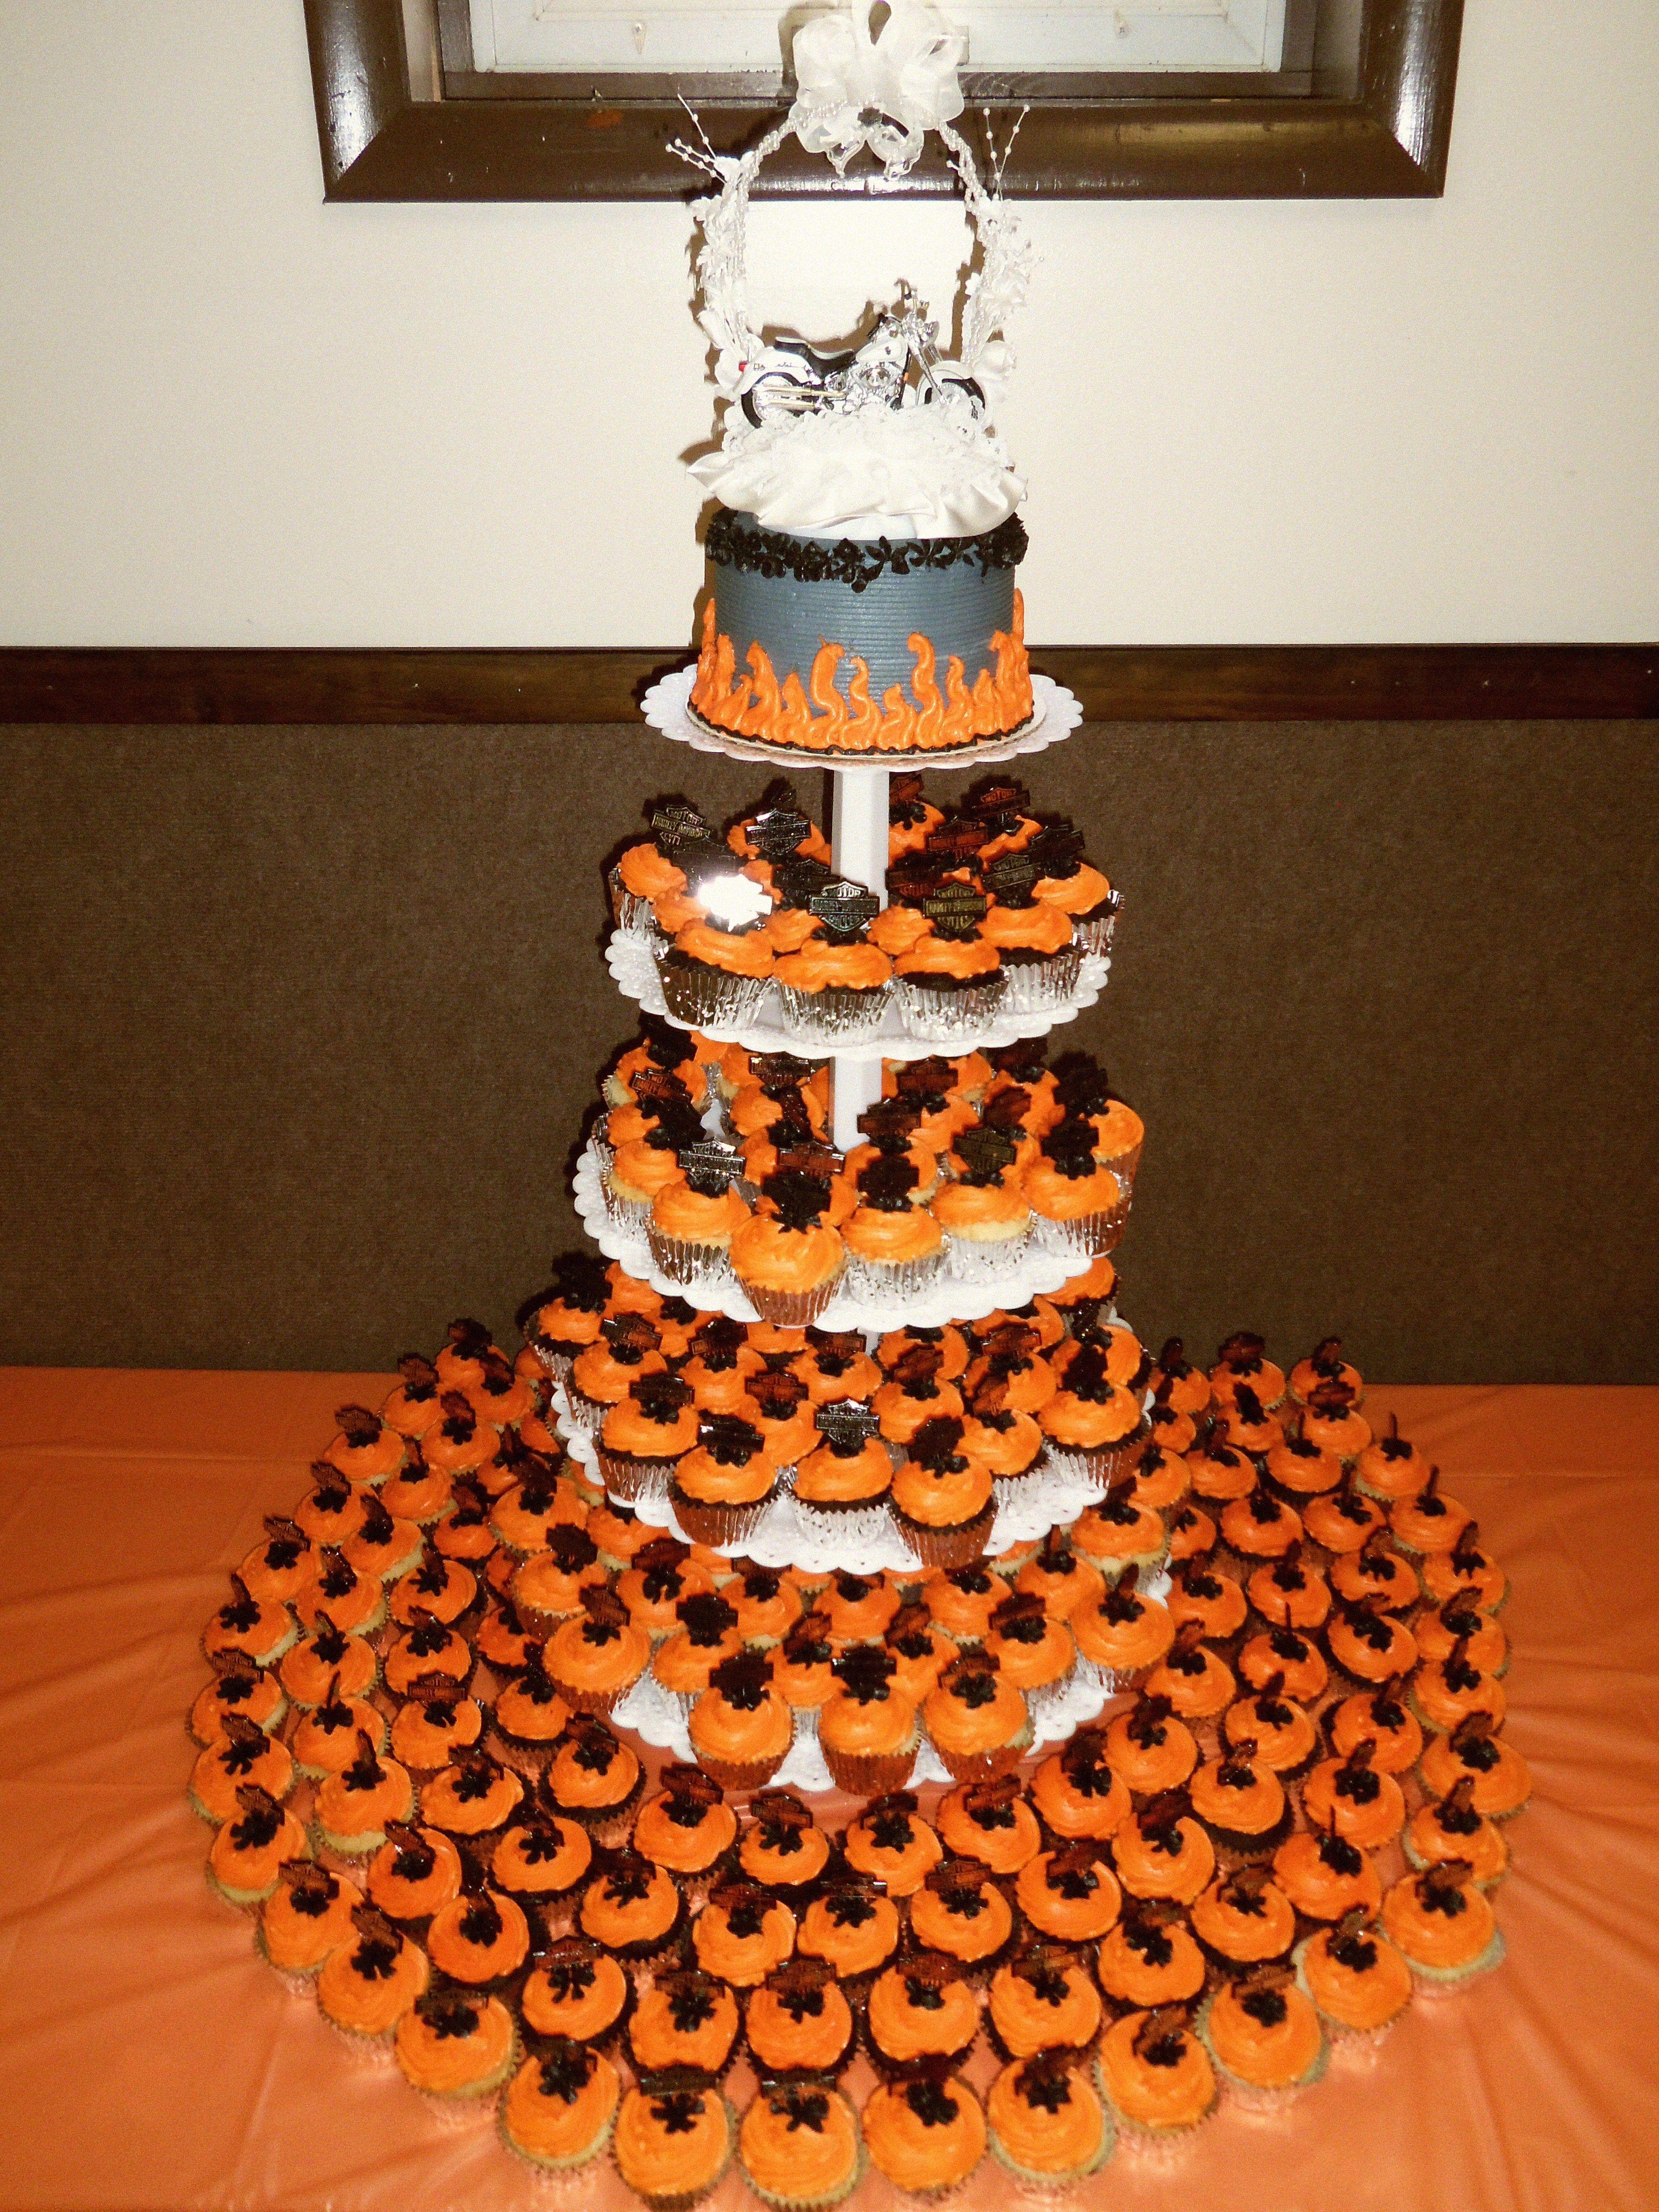 Harley Davidson Cupcake Wedding Cake by Nancy K. | Great Cakes ...